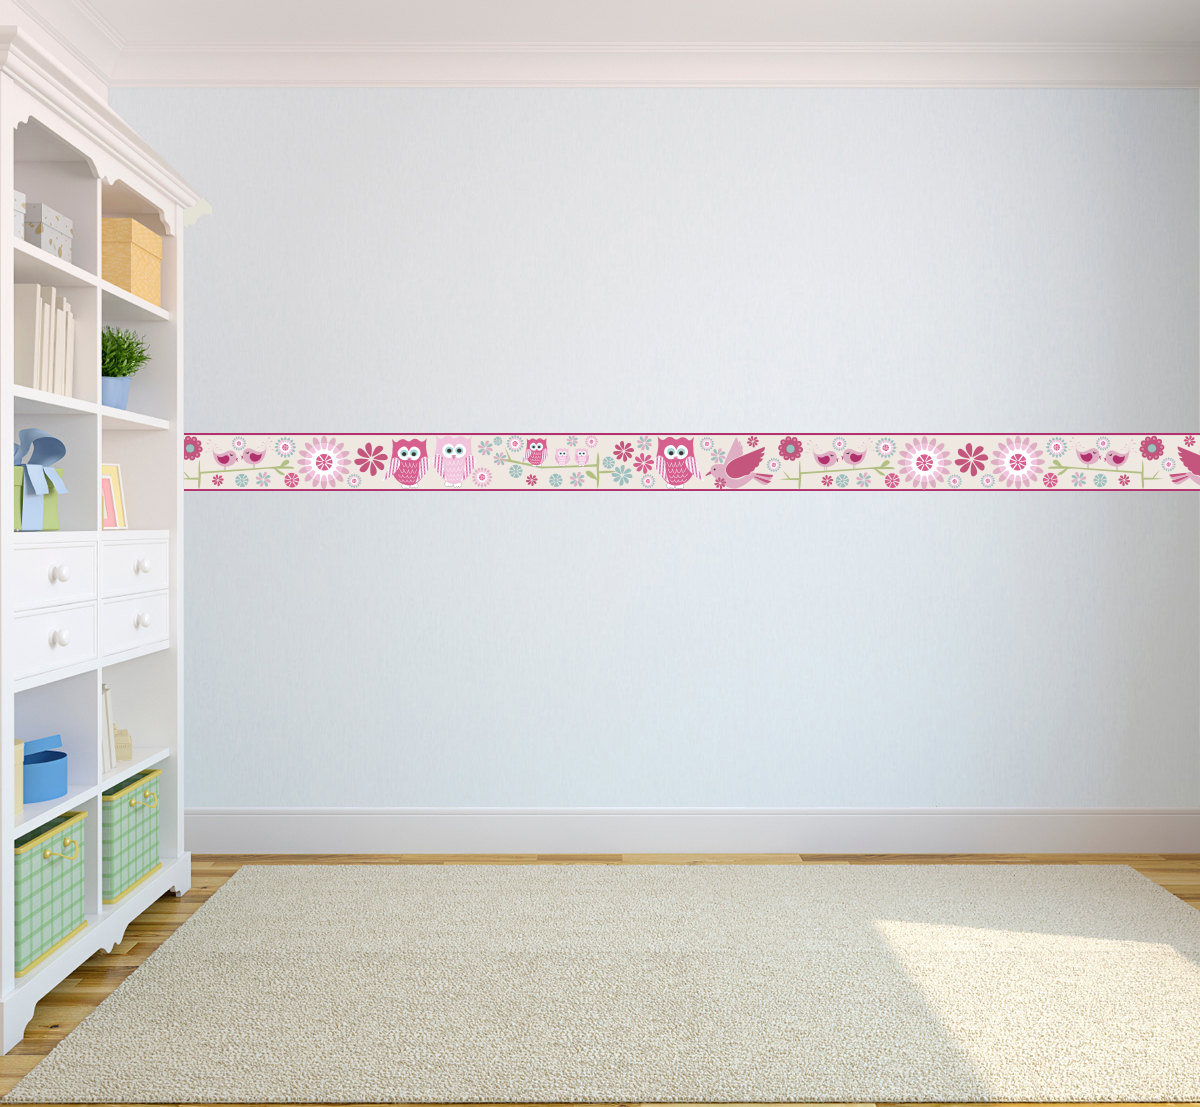 Free download Wallpaper Borders Childrens Kids Nursery Boys ...